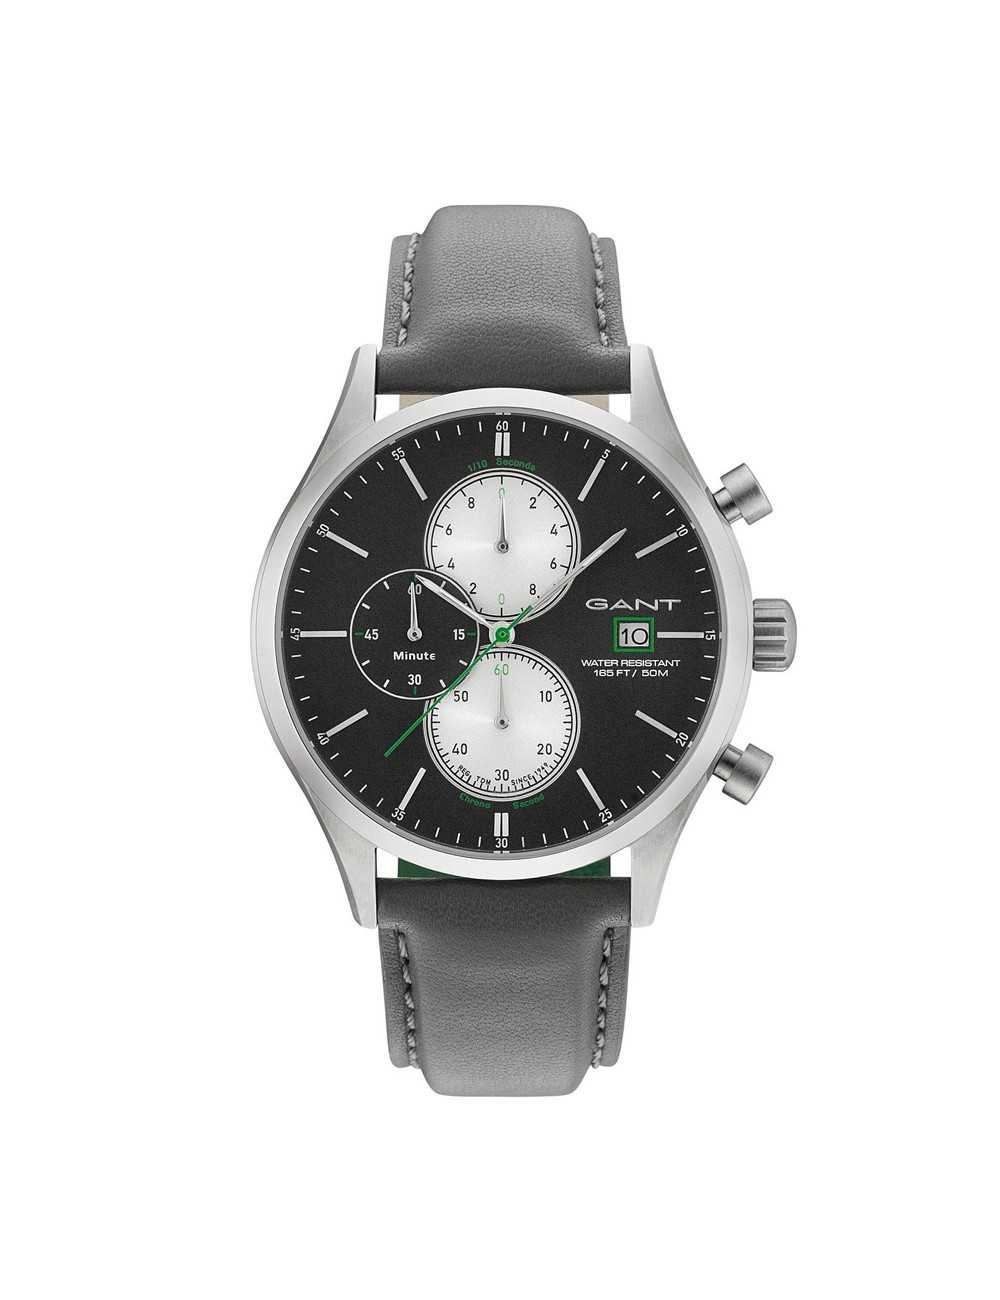 Gant Vermont W70410 Mens Watch Chronograph